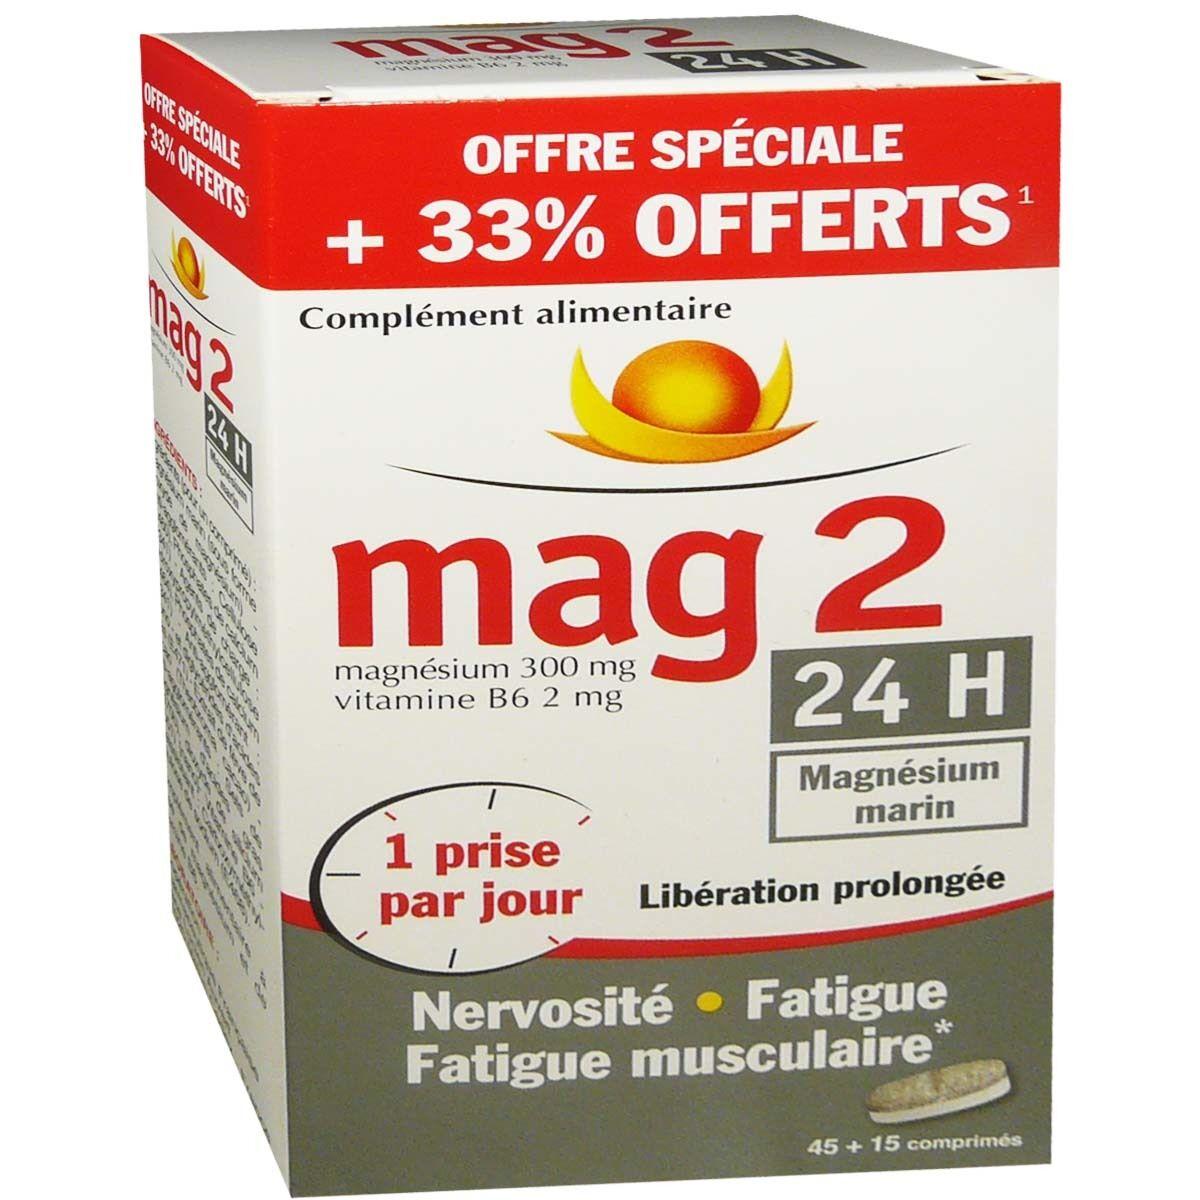 COOPER Mag2 24h magnesium marin 45 + 15 comprimes offerts